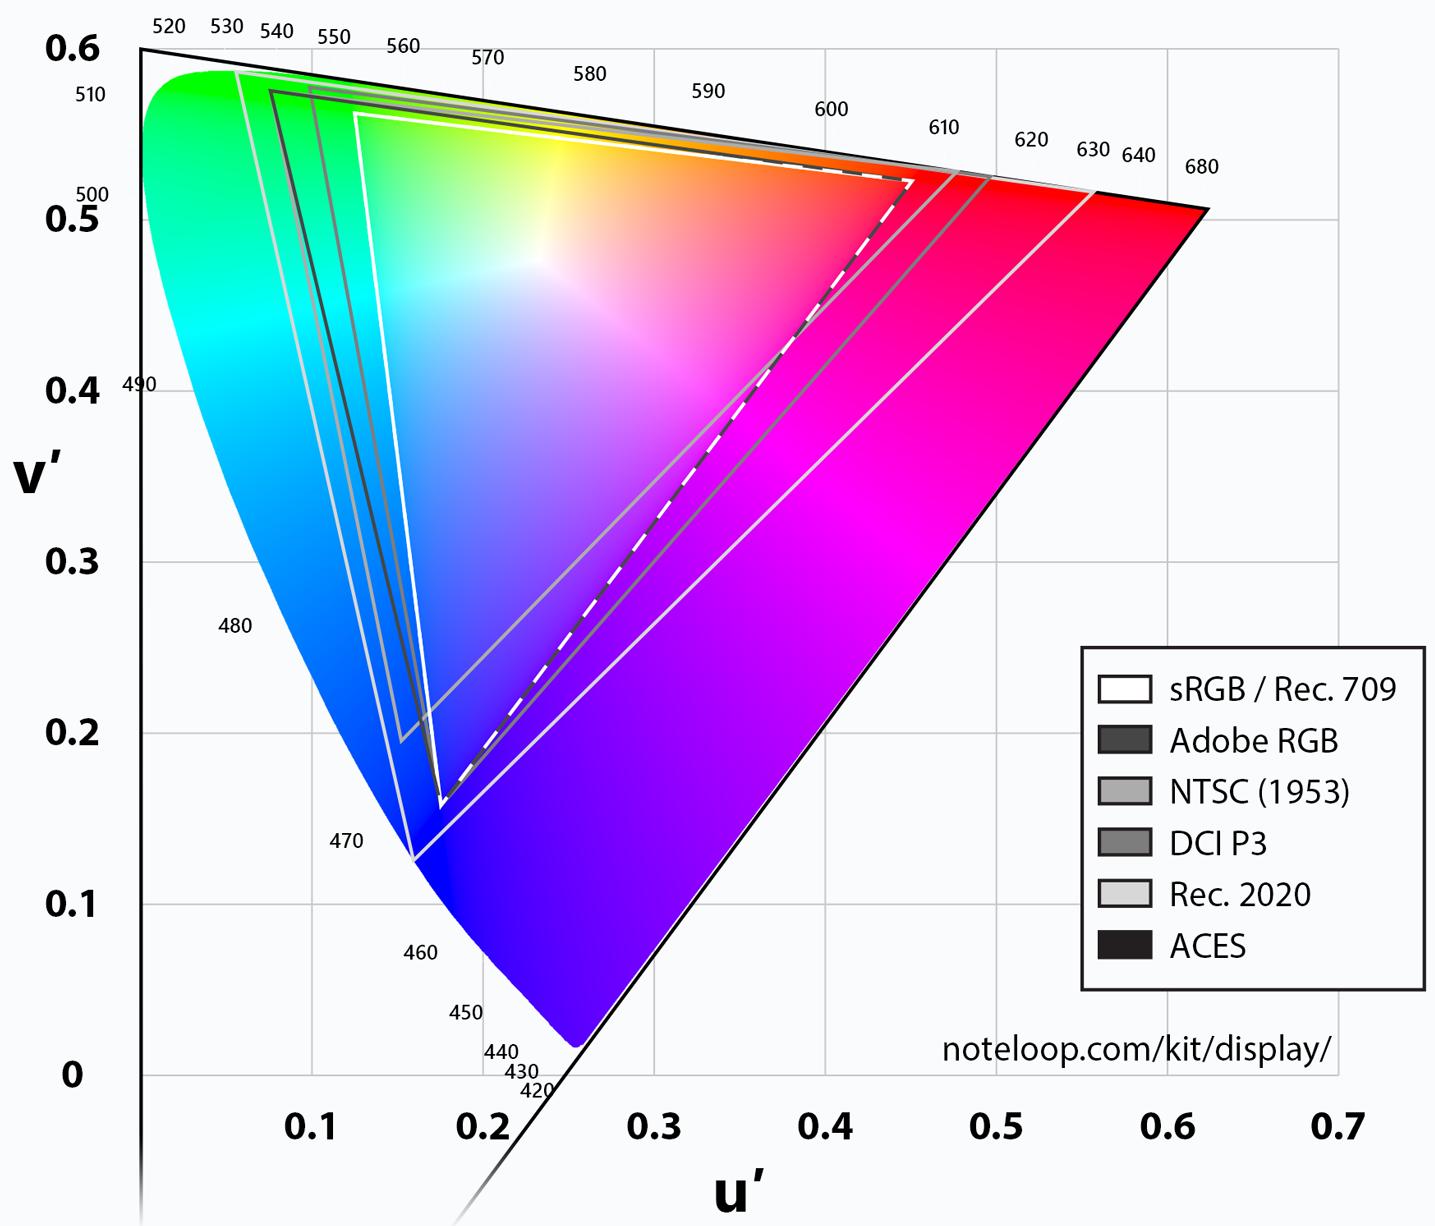 http://www.noteloop.com/kit/display/color-space/aces/